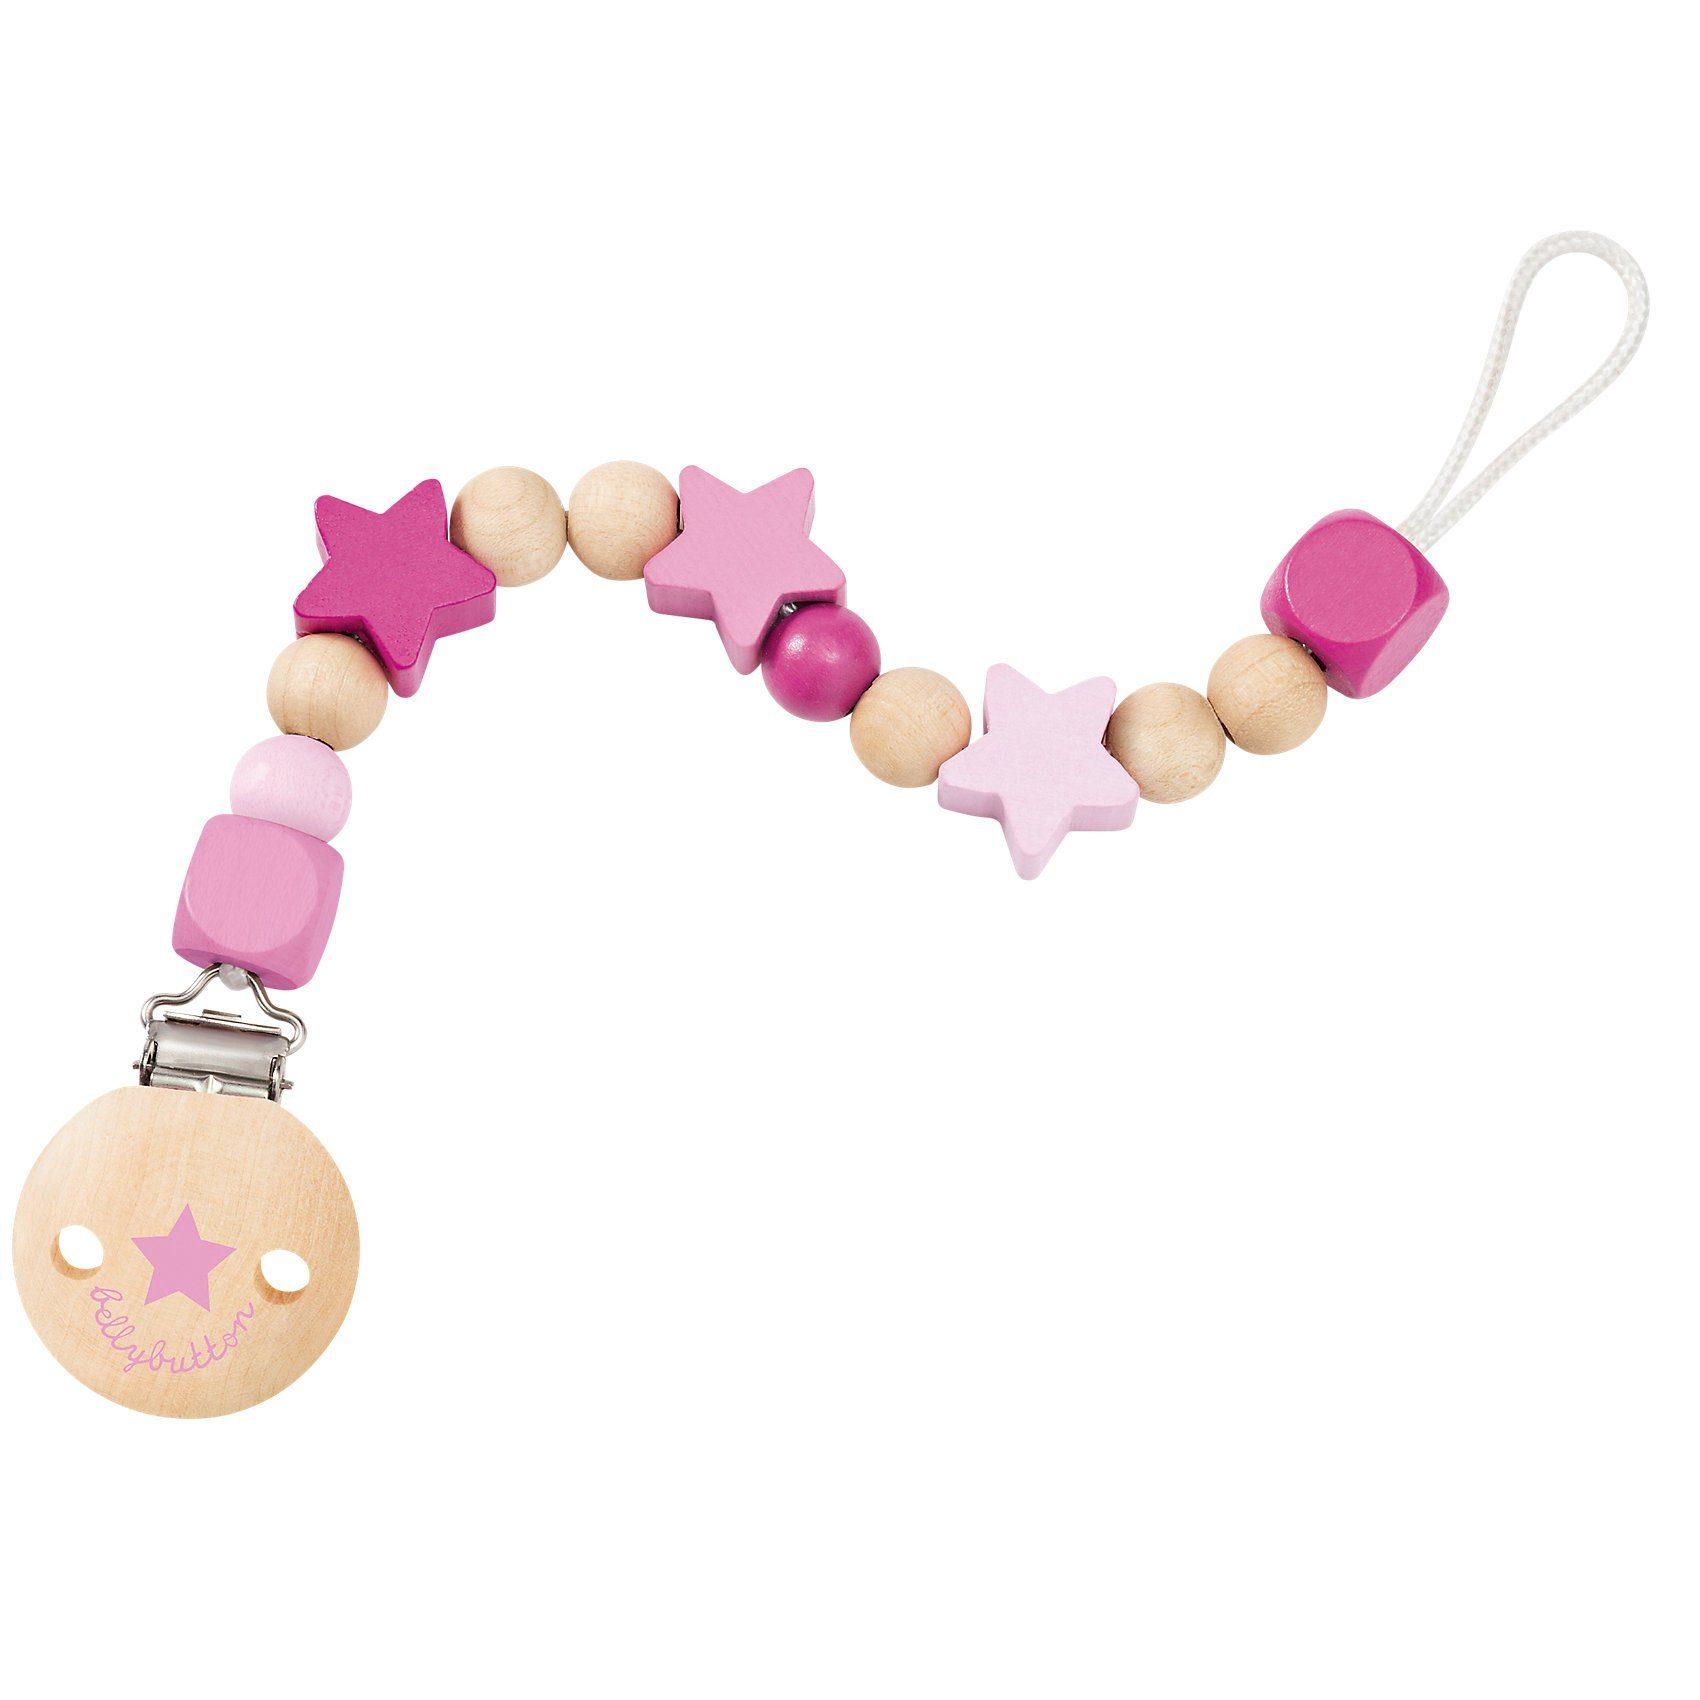 Selecta Sternchenglück Schnullerkette rosa